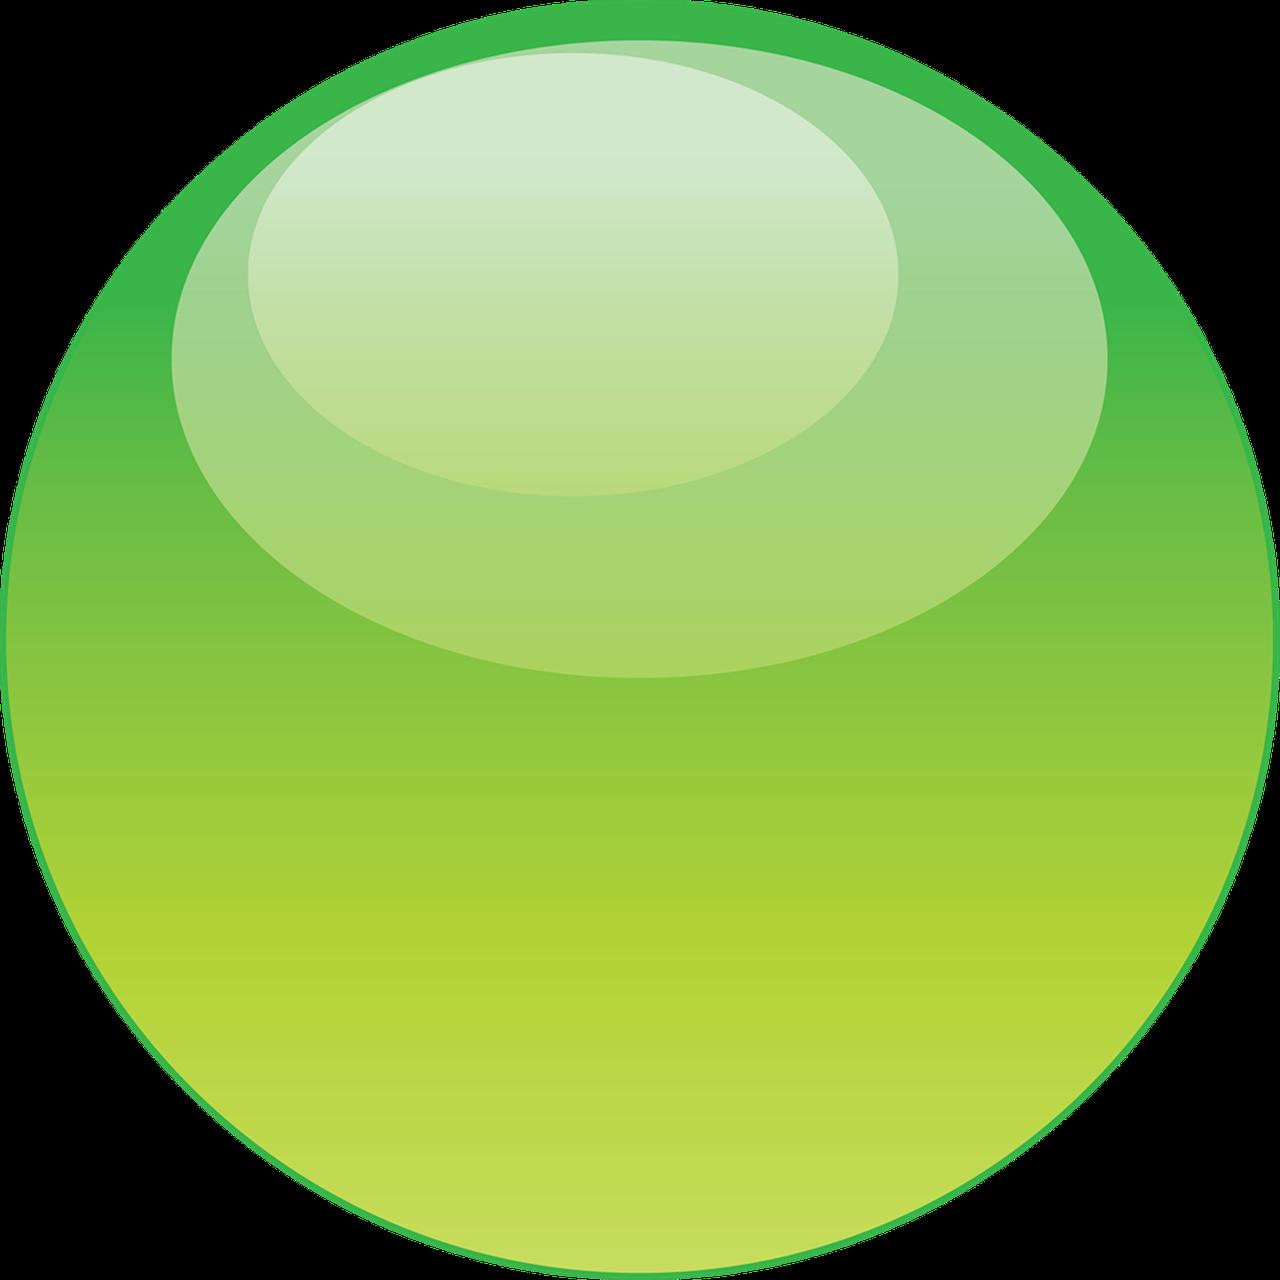 1280x1280 Oval Clipart Jade